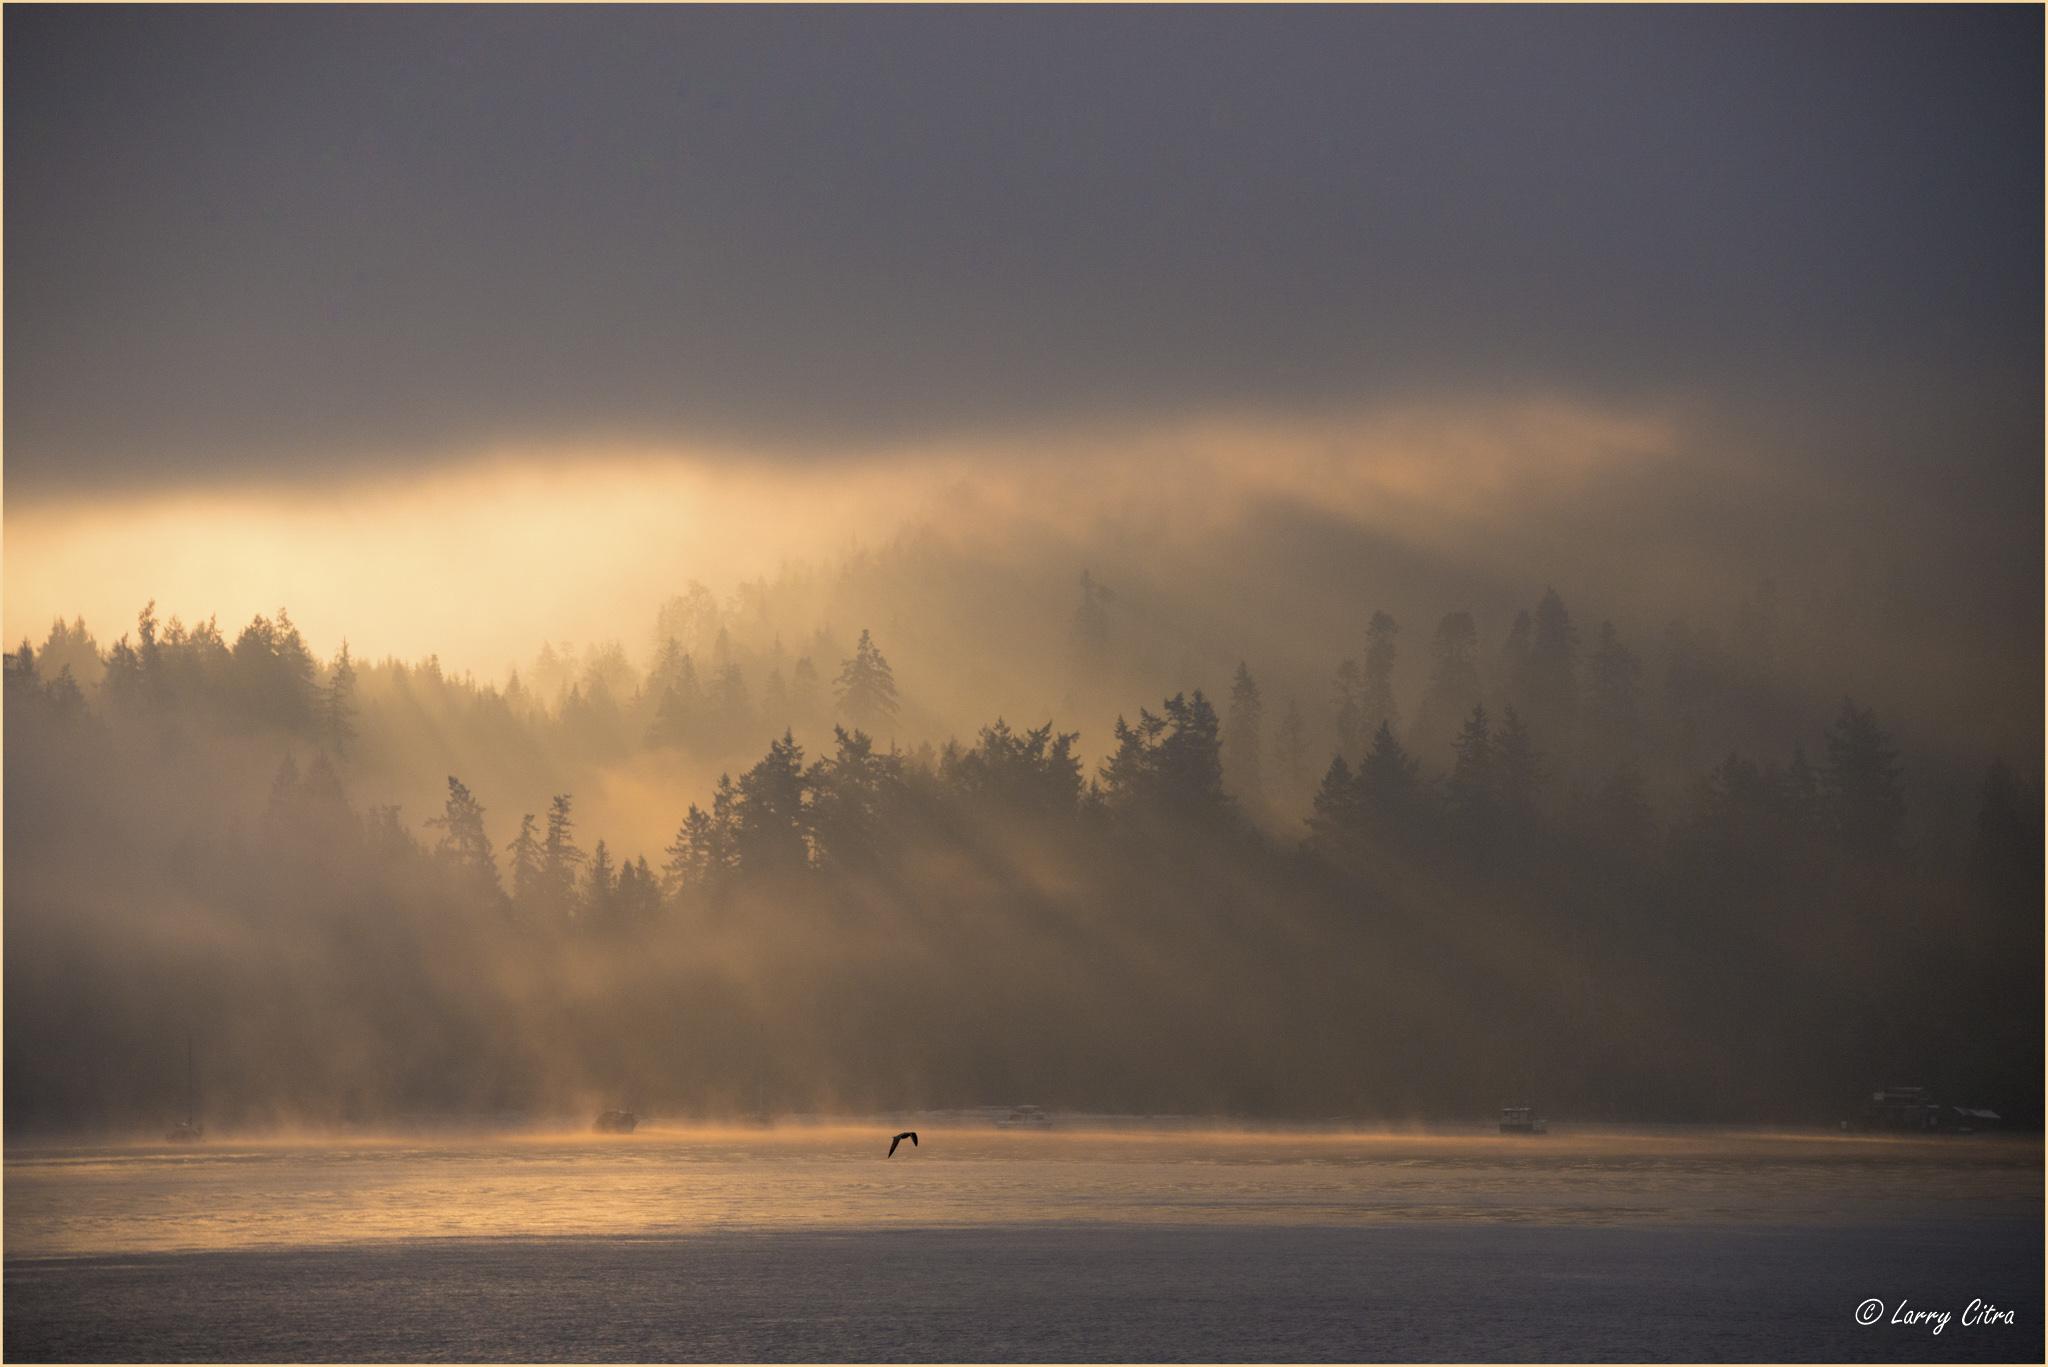 Sunrise, Burgoyne Bay, Salt Spring Island_Stroked © Larry Citra